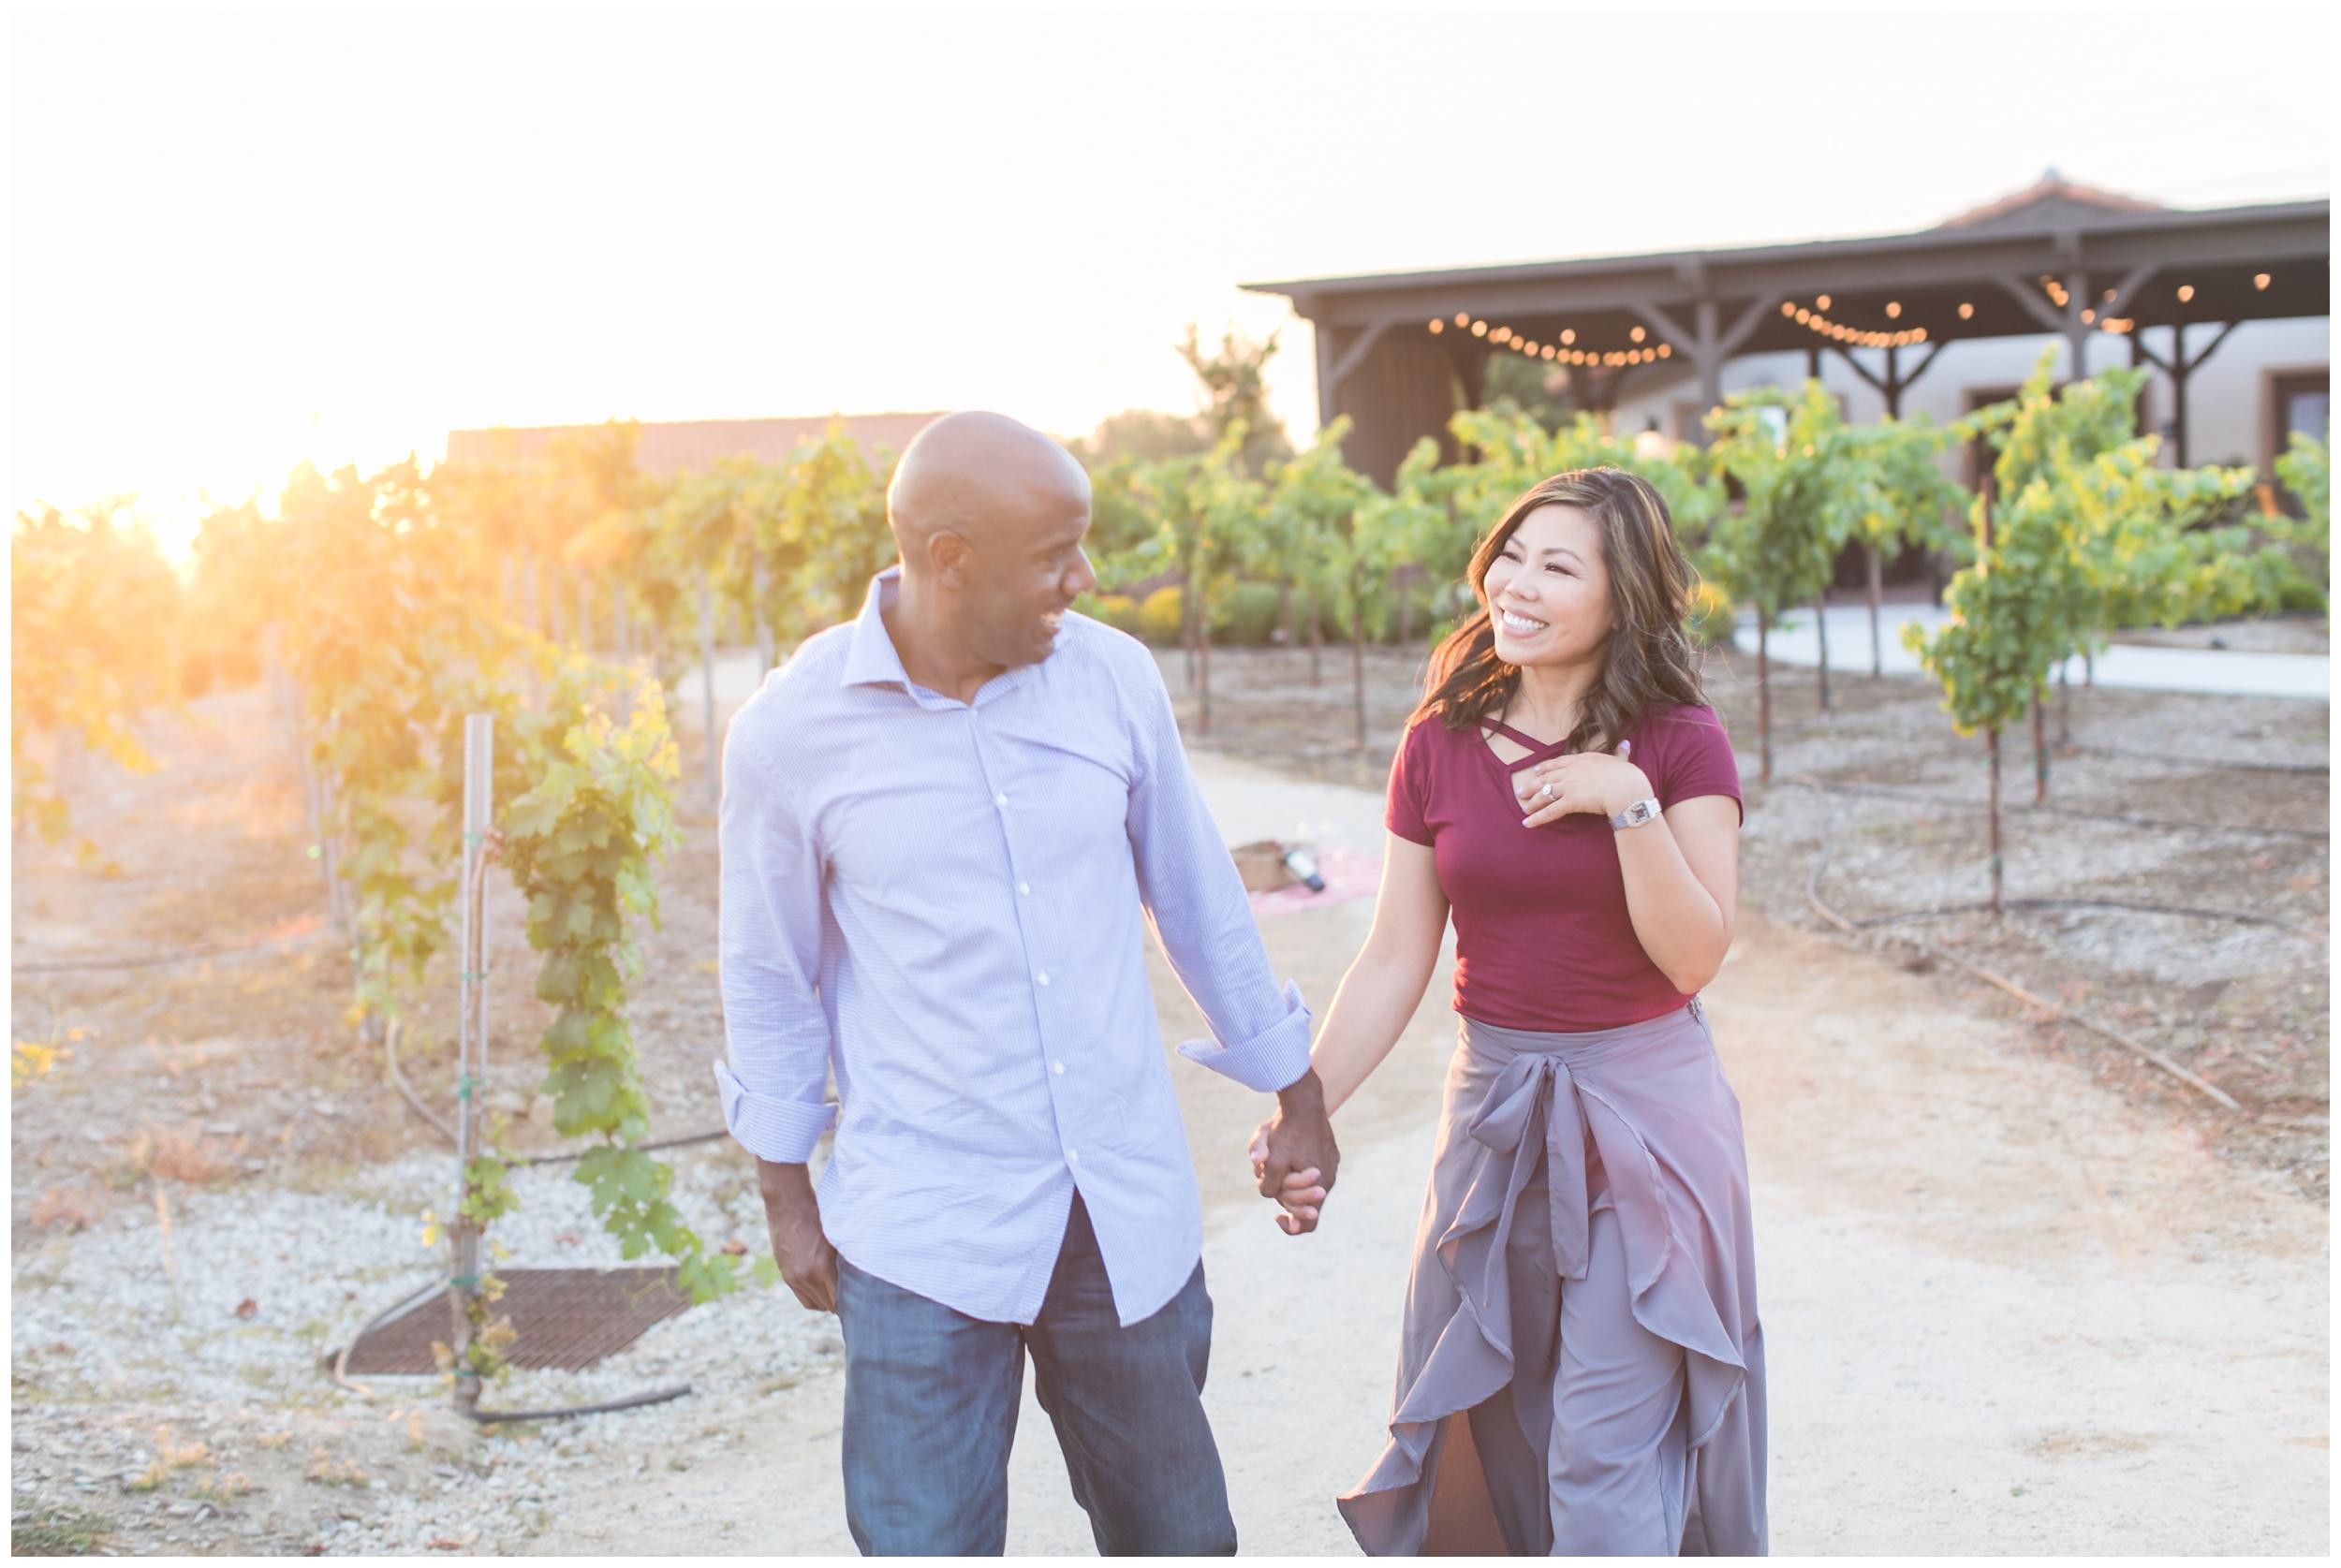 temecula-winery-engagement-wedding-photographer-carrie-vines0019.jpg